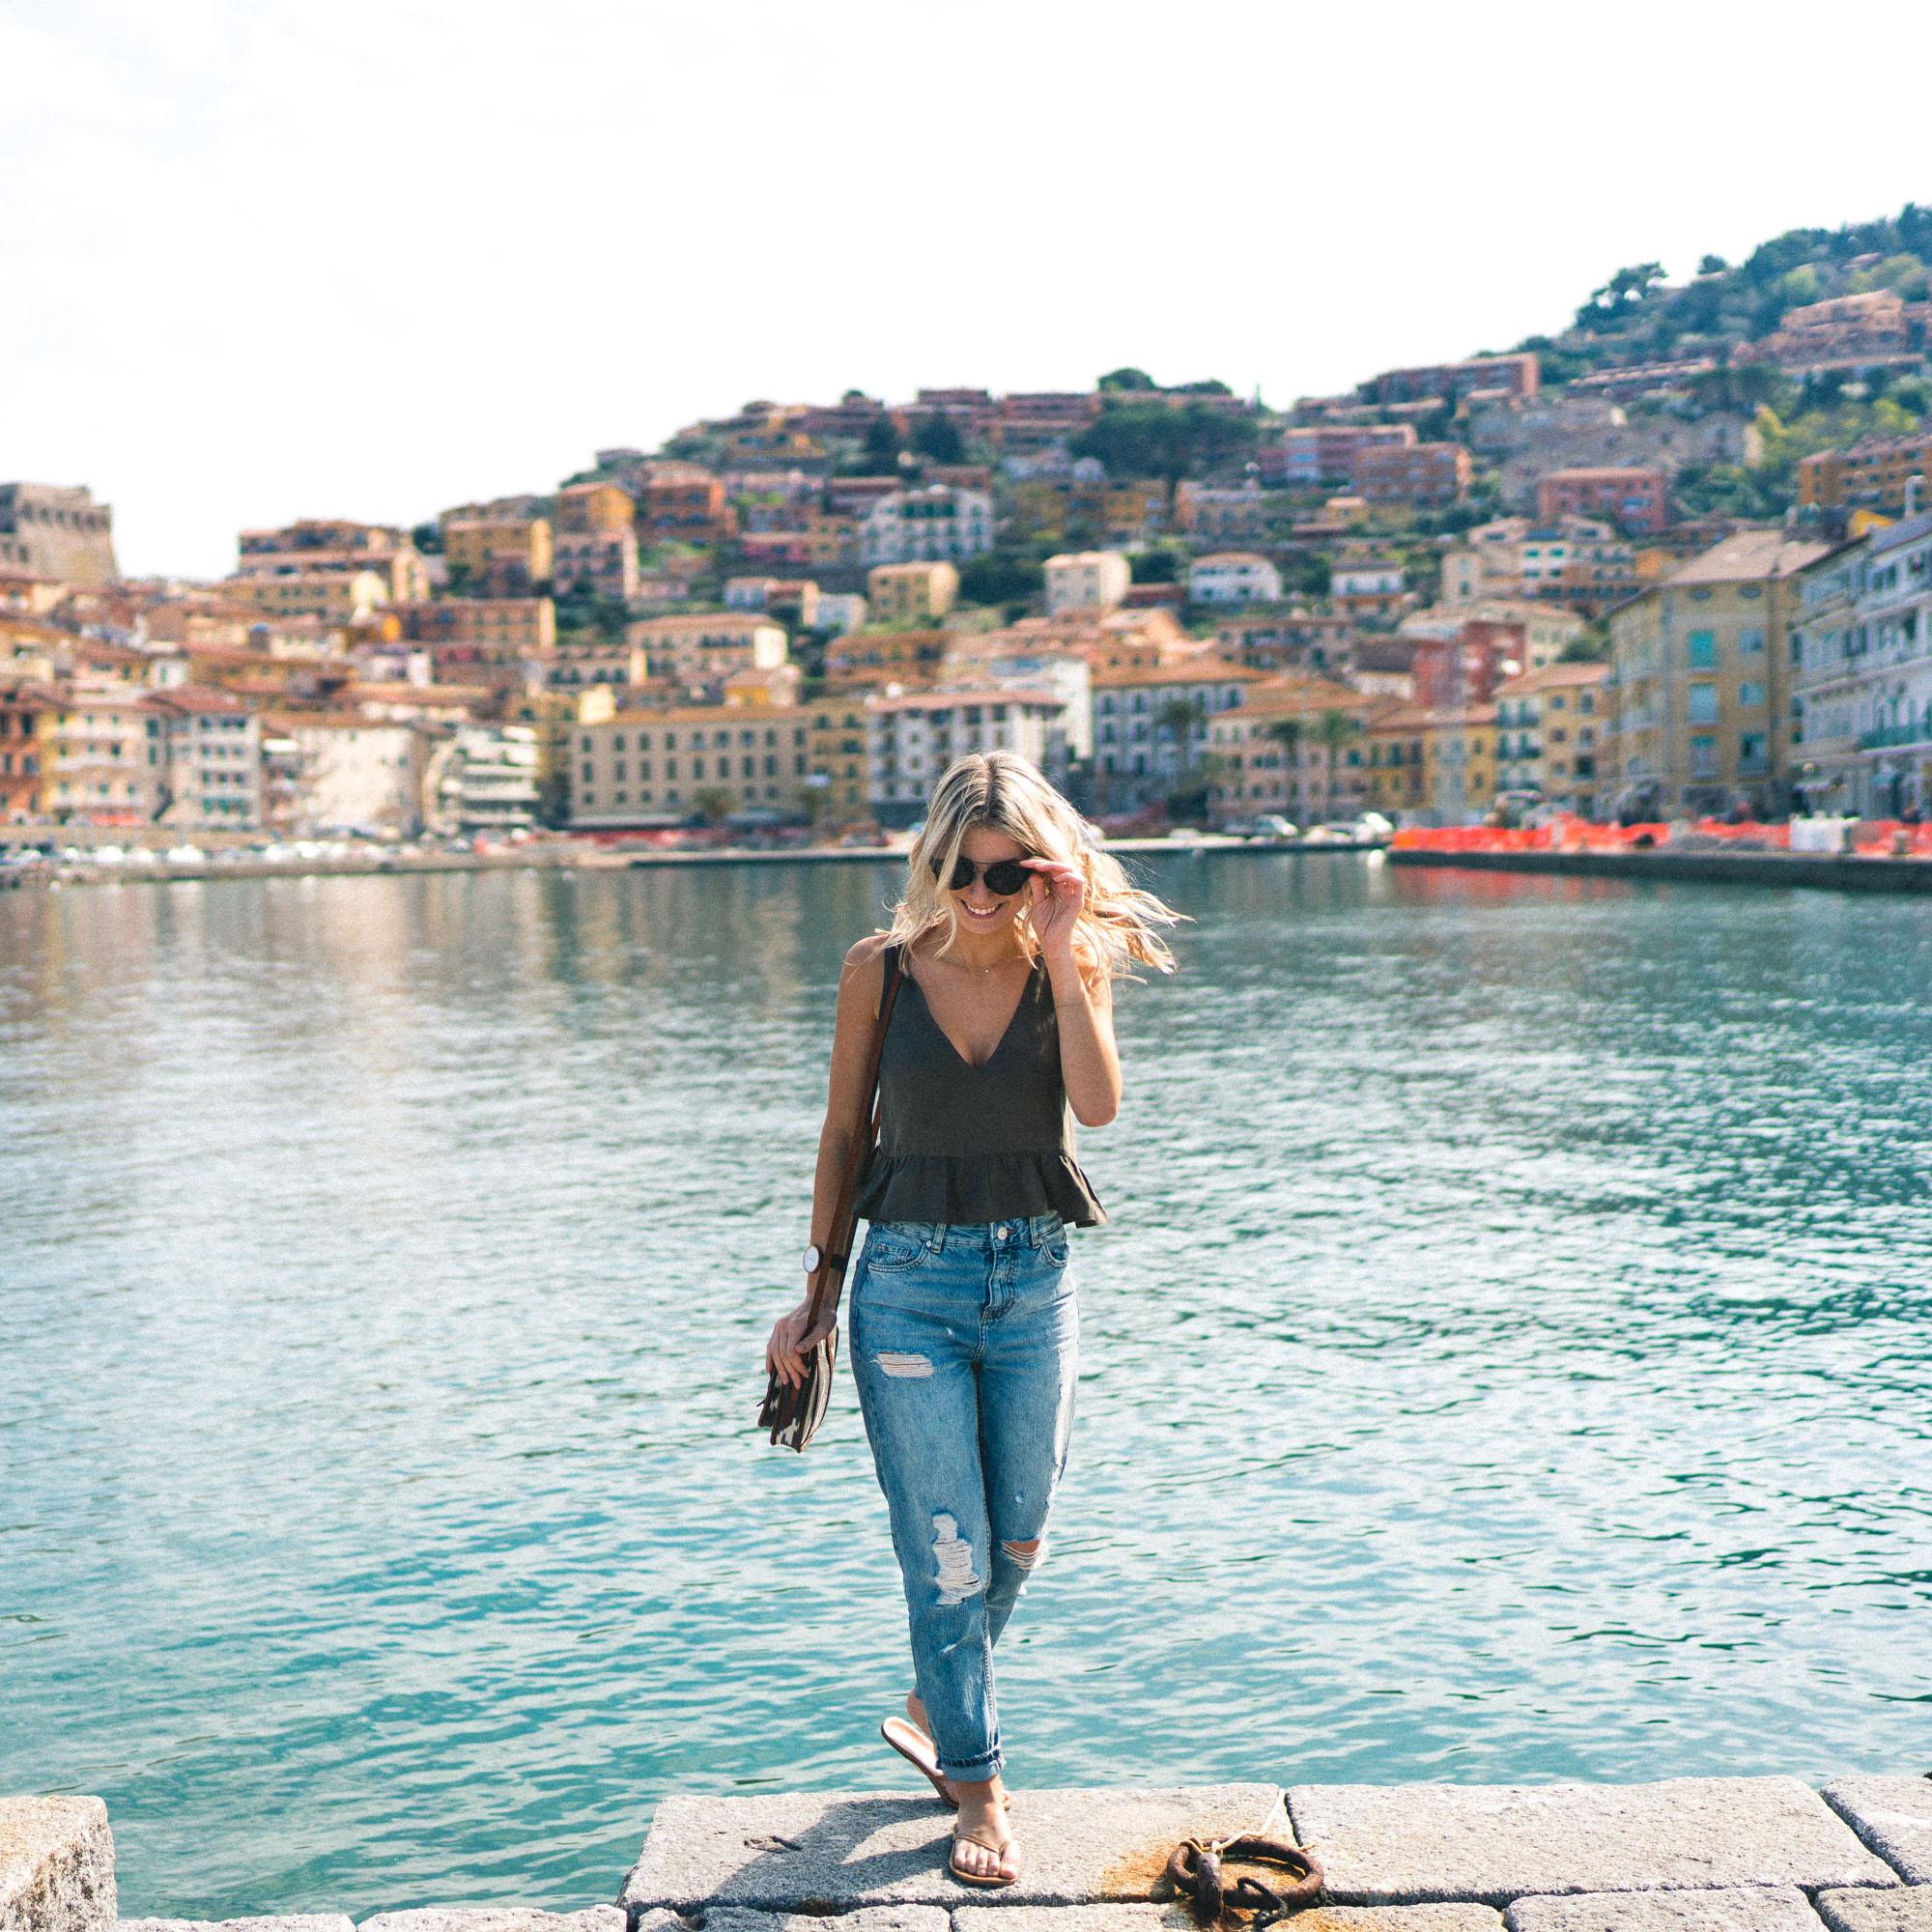 Porto Santo Stefano seaside town in southern Tuscany, Italy